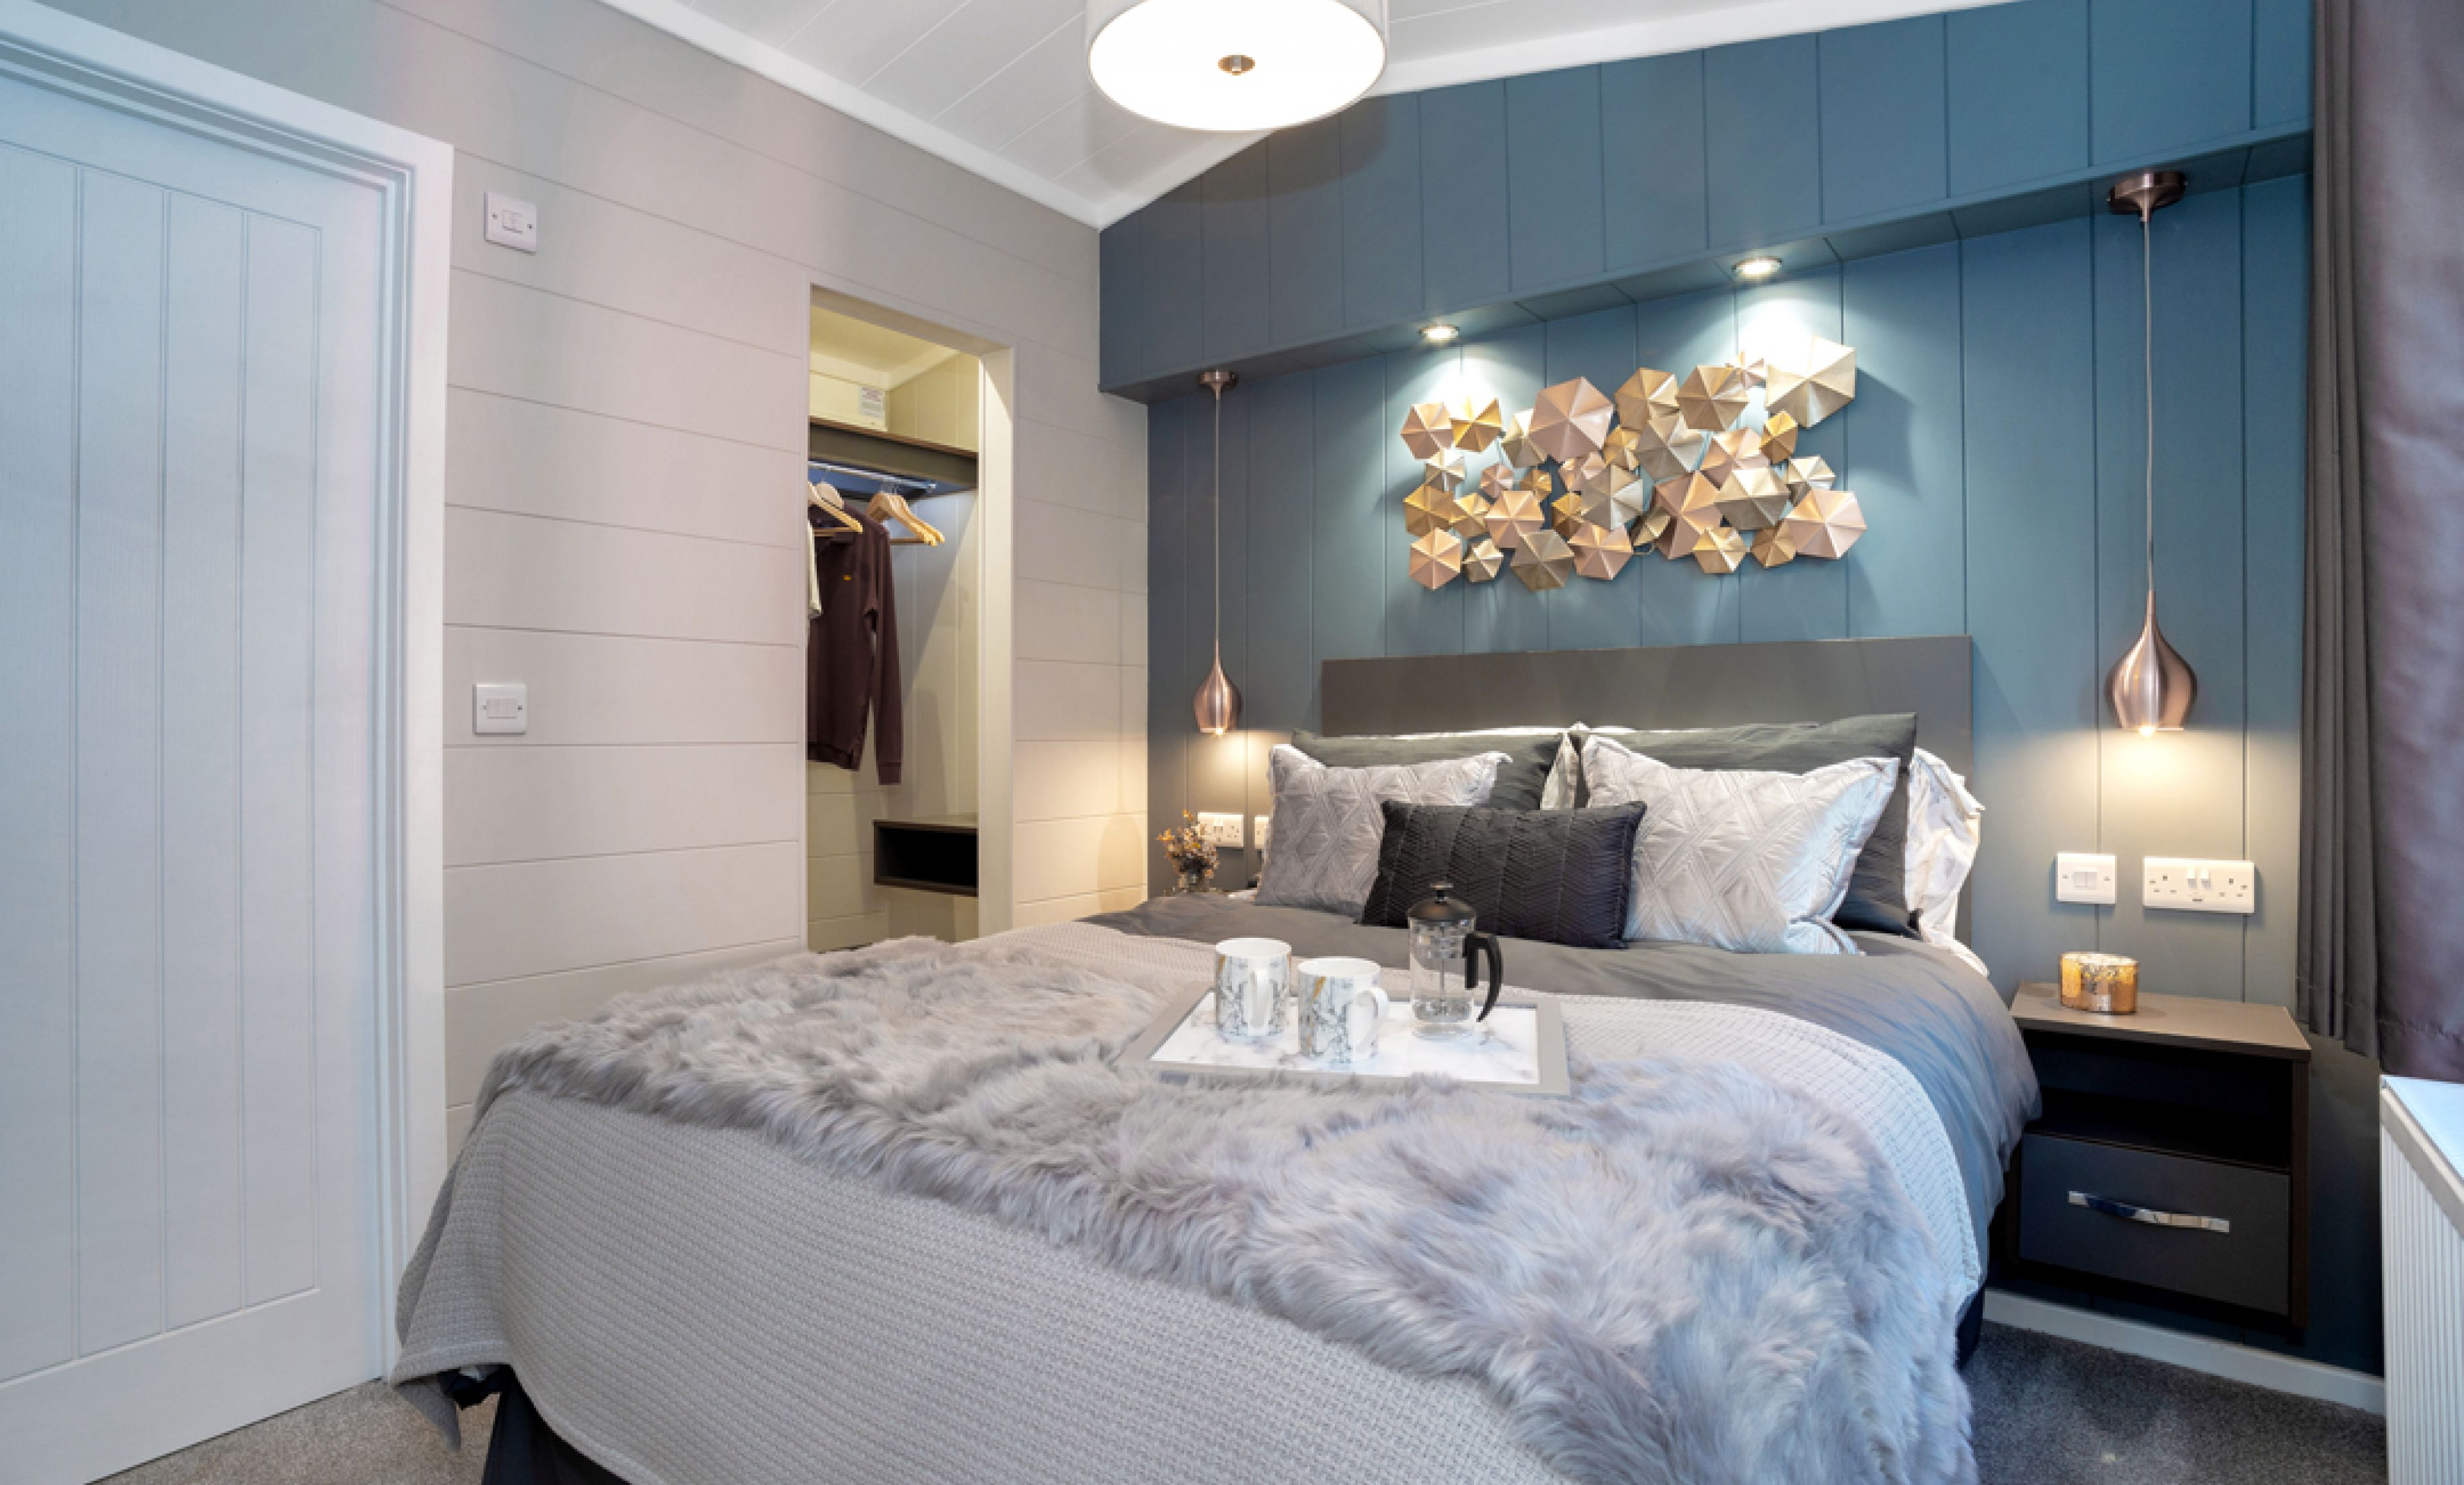 The Savannah - Bedroom